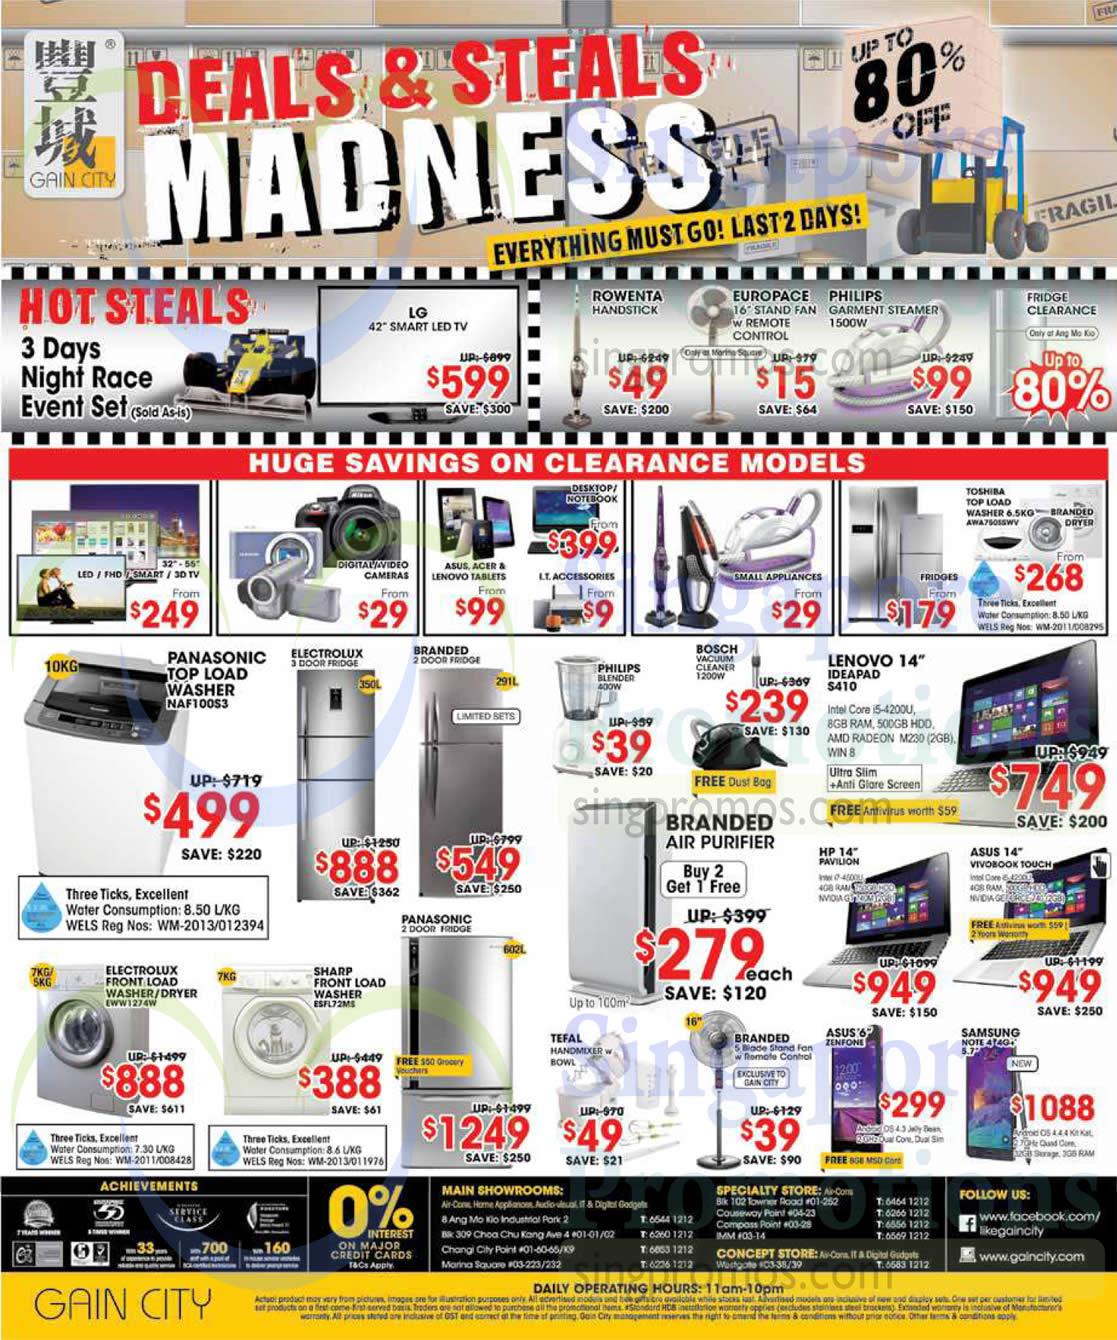 Fridges, Washers, Notebooks, Mobile Phones, Panasonic, Electrolux, Philips, Bosch, Asus, HP, Tefal